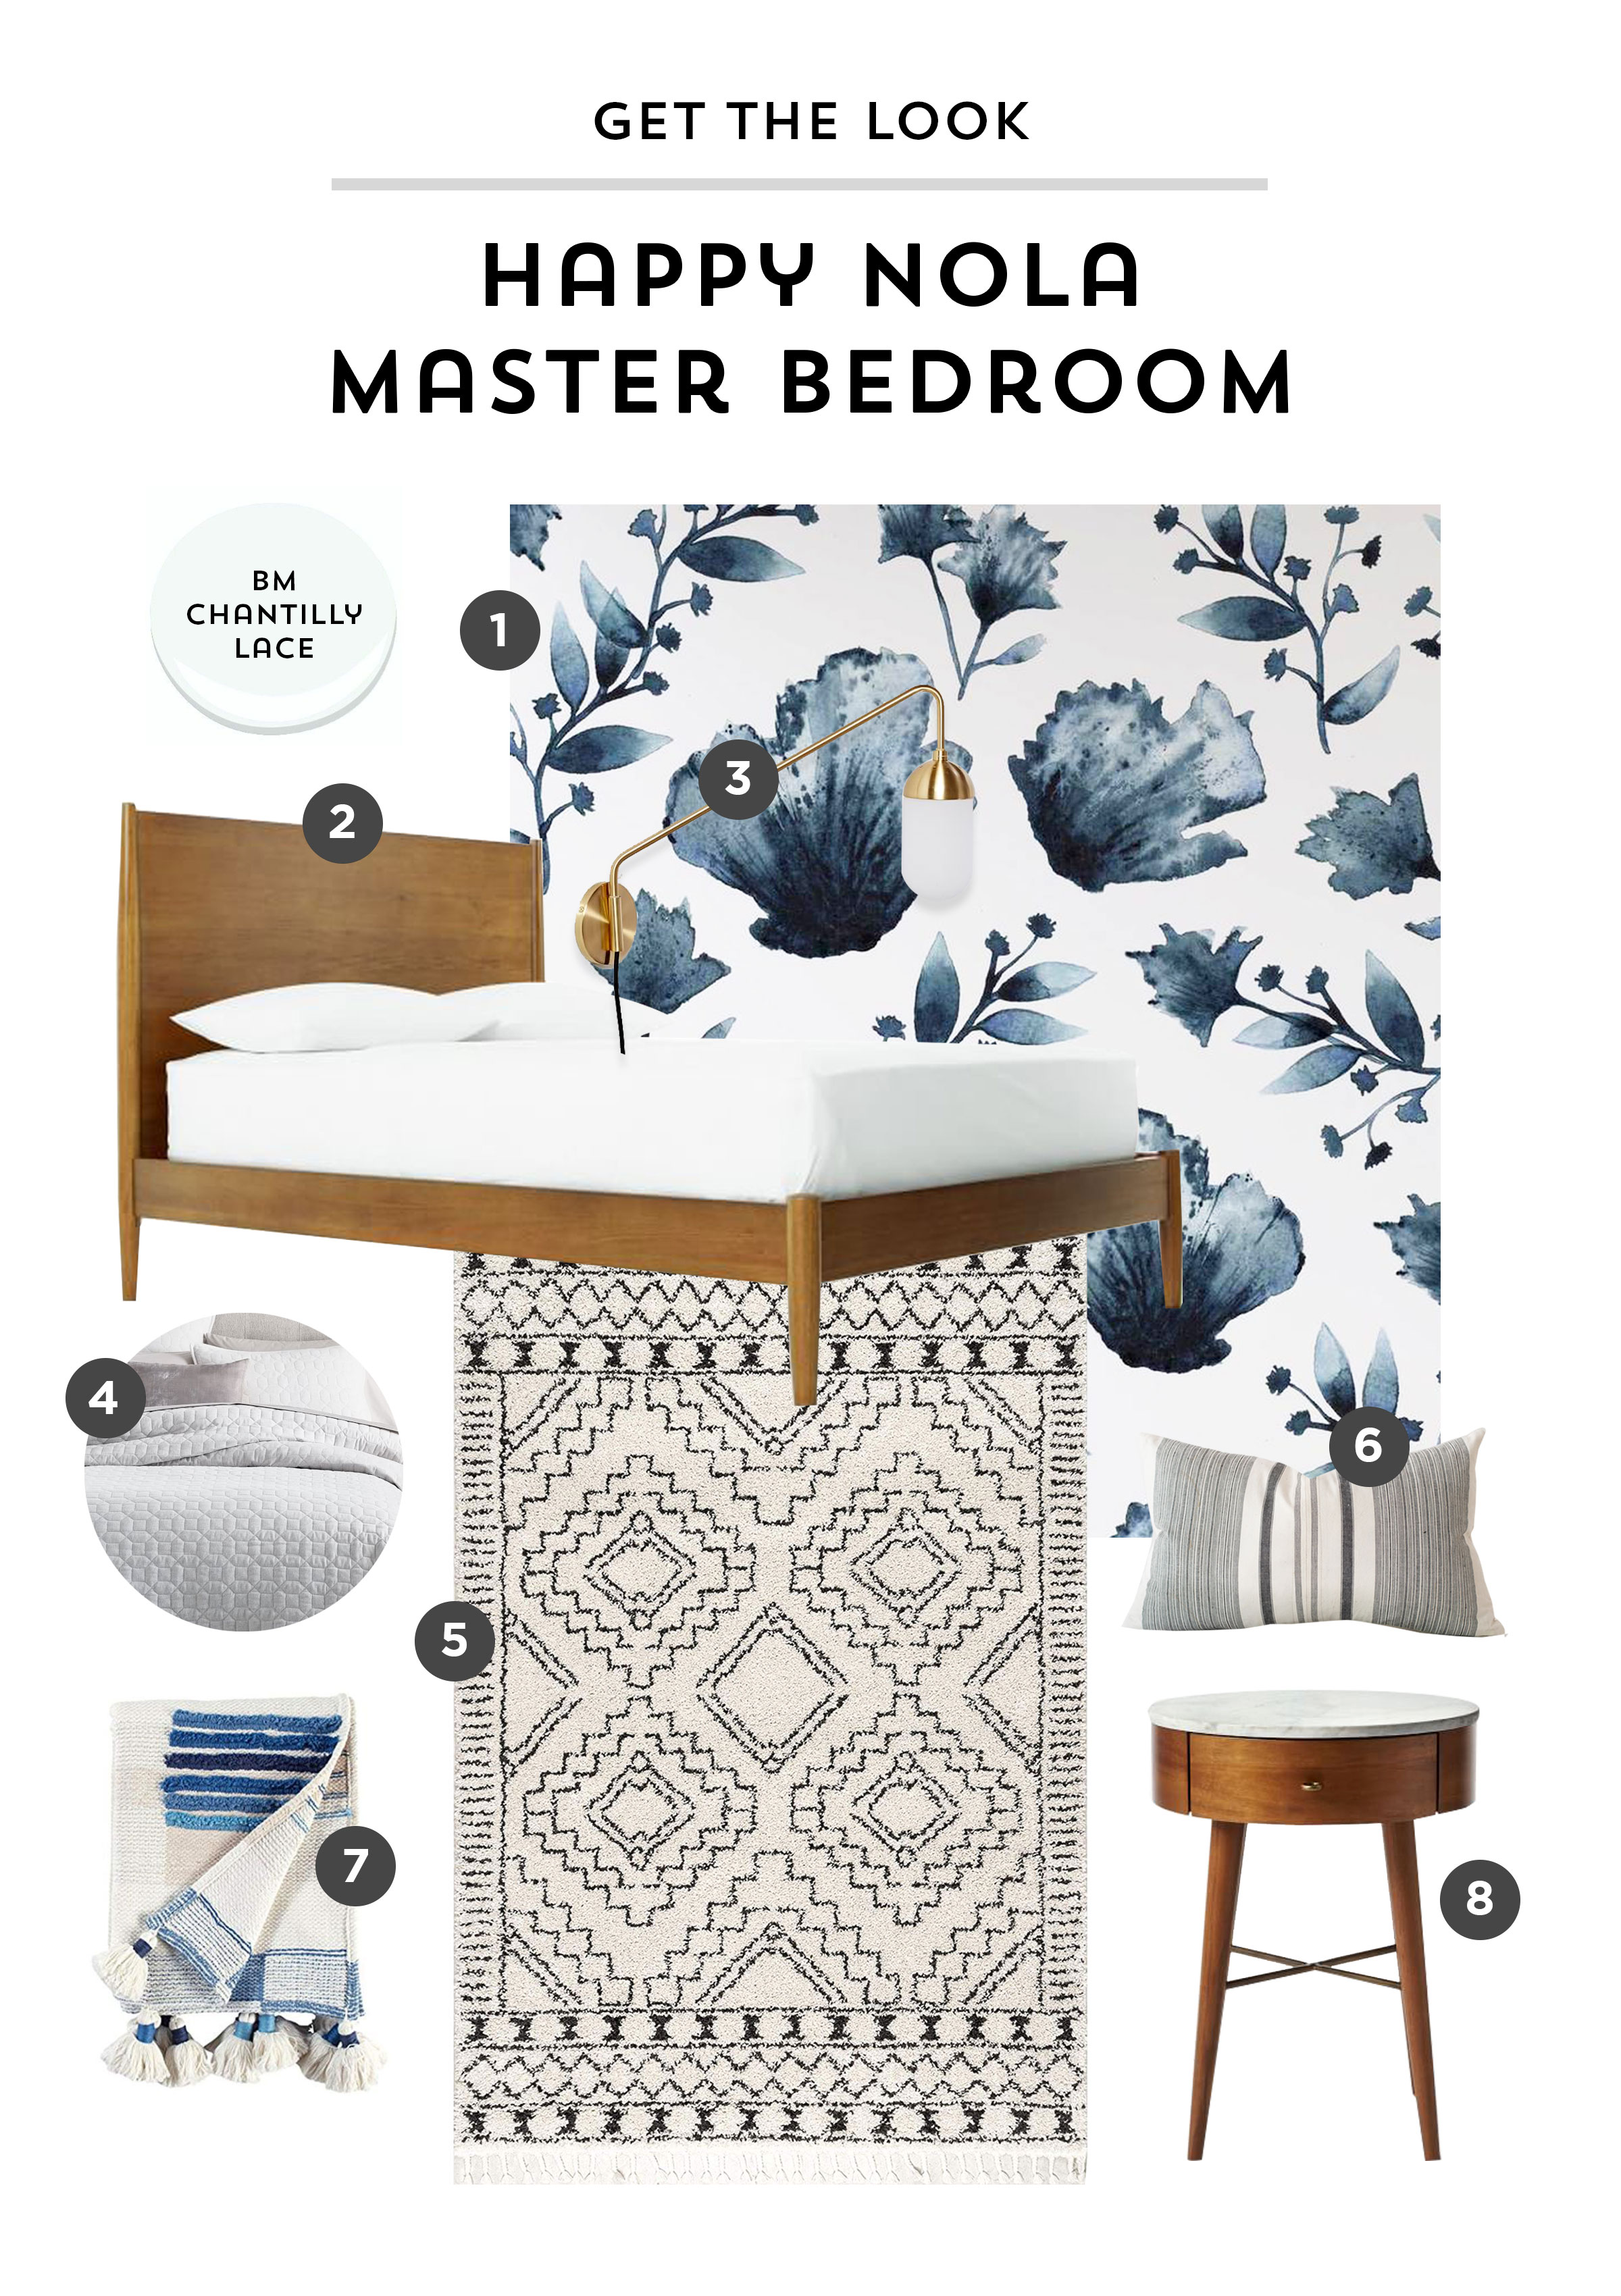 nola-master-bed-get-the-look.jpg